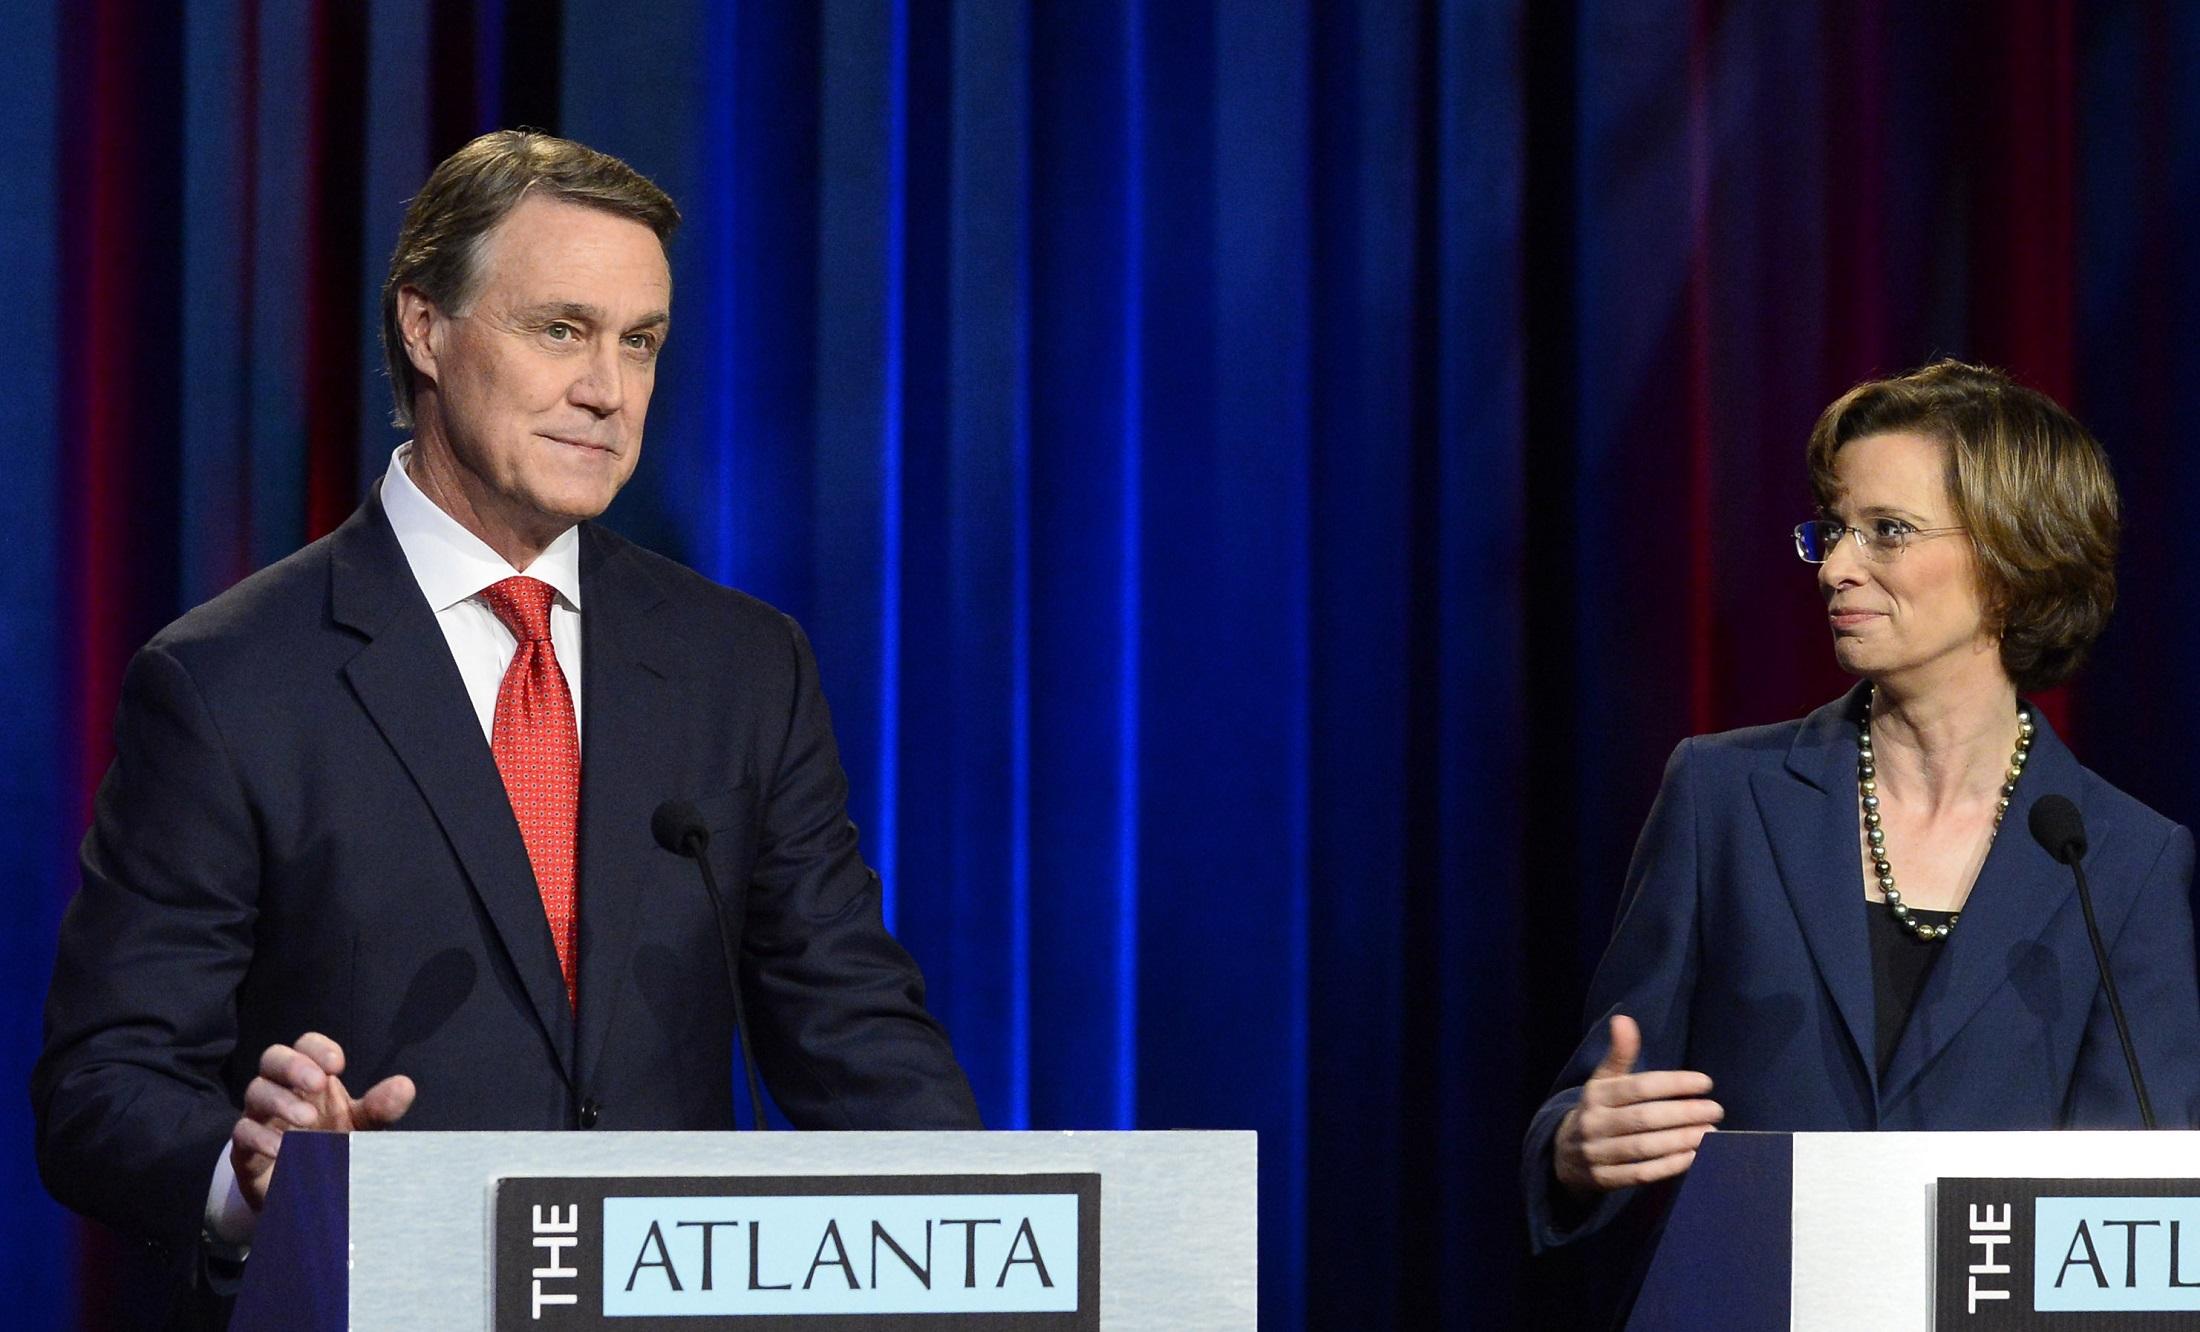 U.S. Senate hopefuls Republican David Perdue and Democrat Michelle Nunn focused mainly on two key talking points during their Atlanta Press Club debate on Oct. 26. David Tulis/ for the AJC